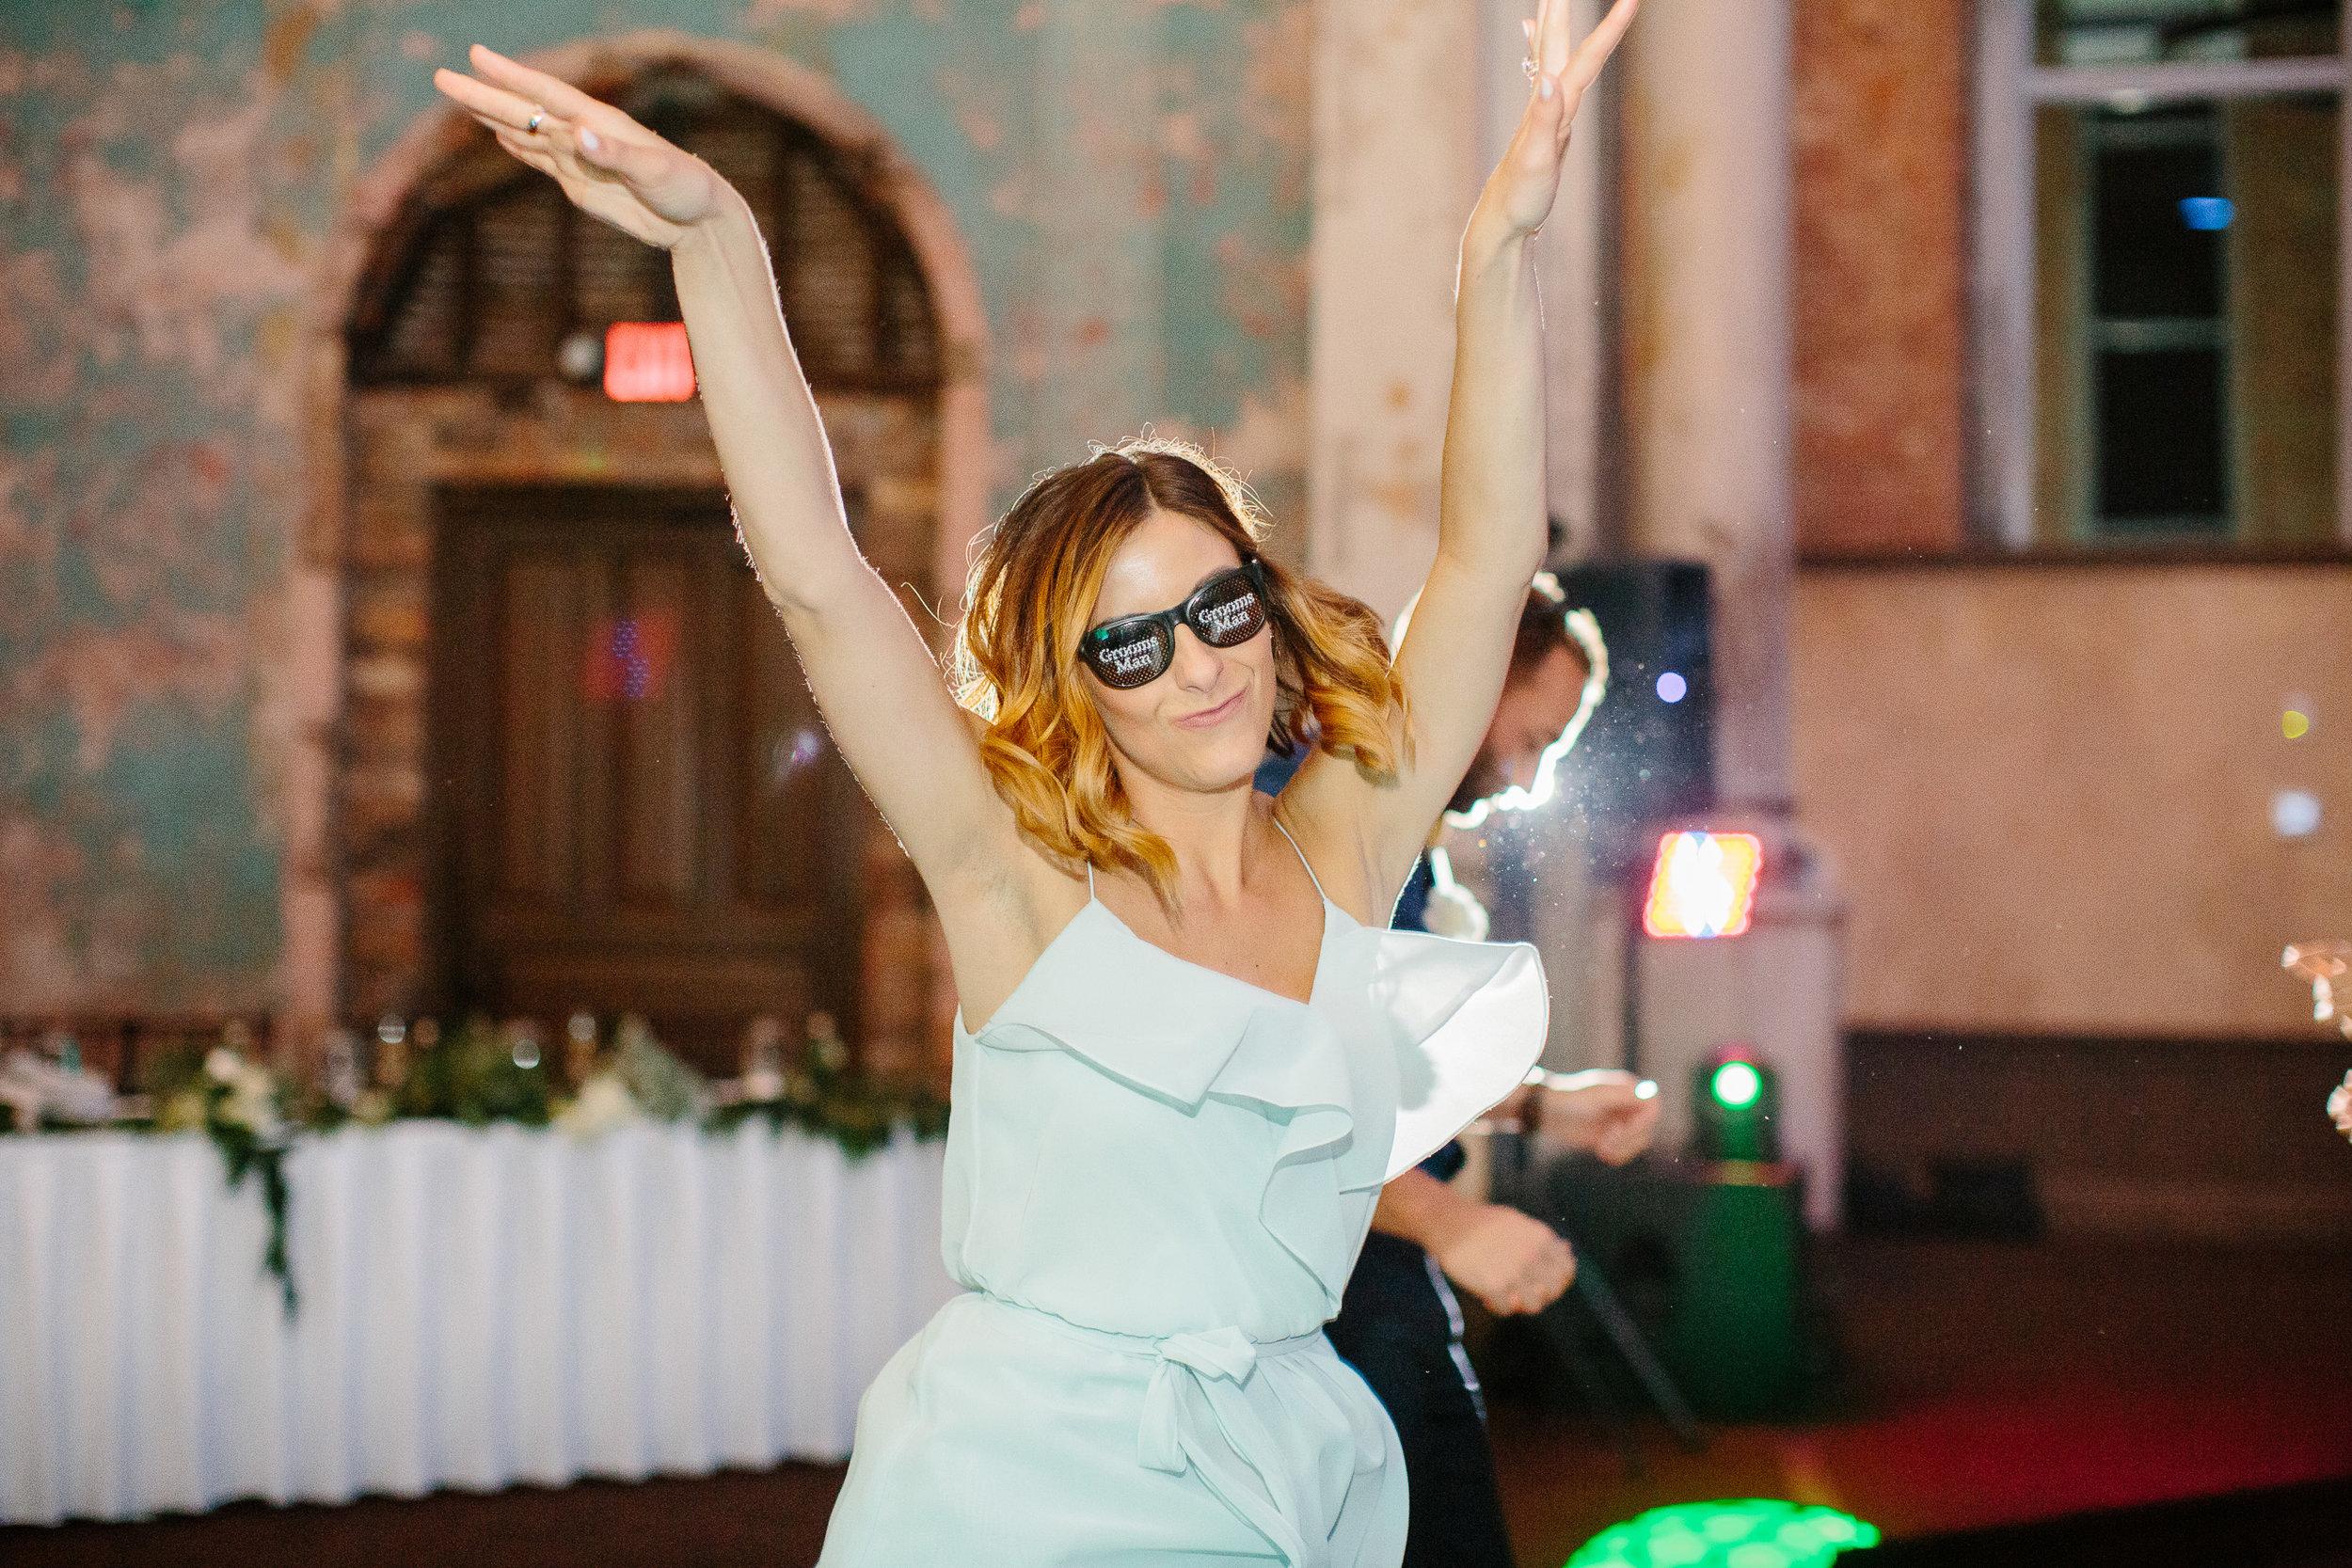 0743_20170819 Randi and Chance Wedding.jpg